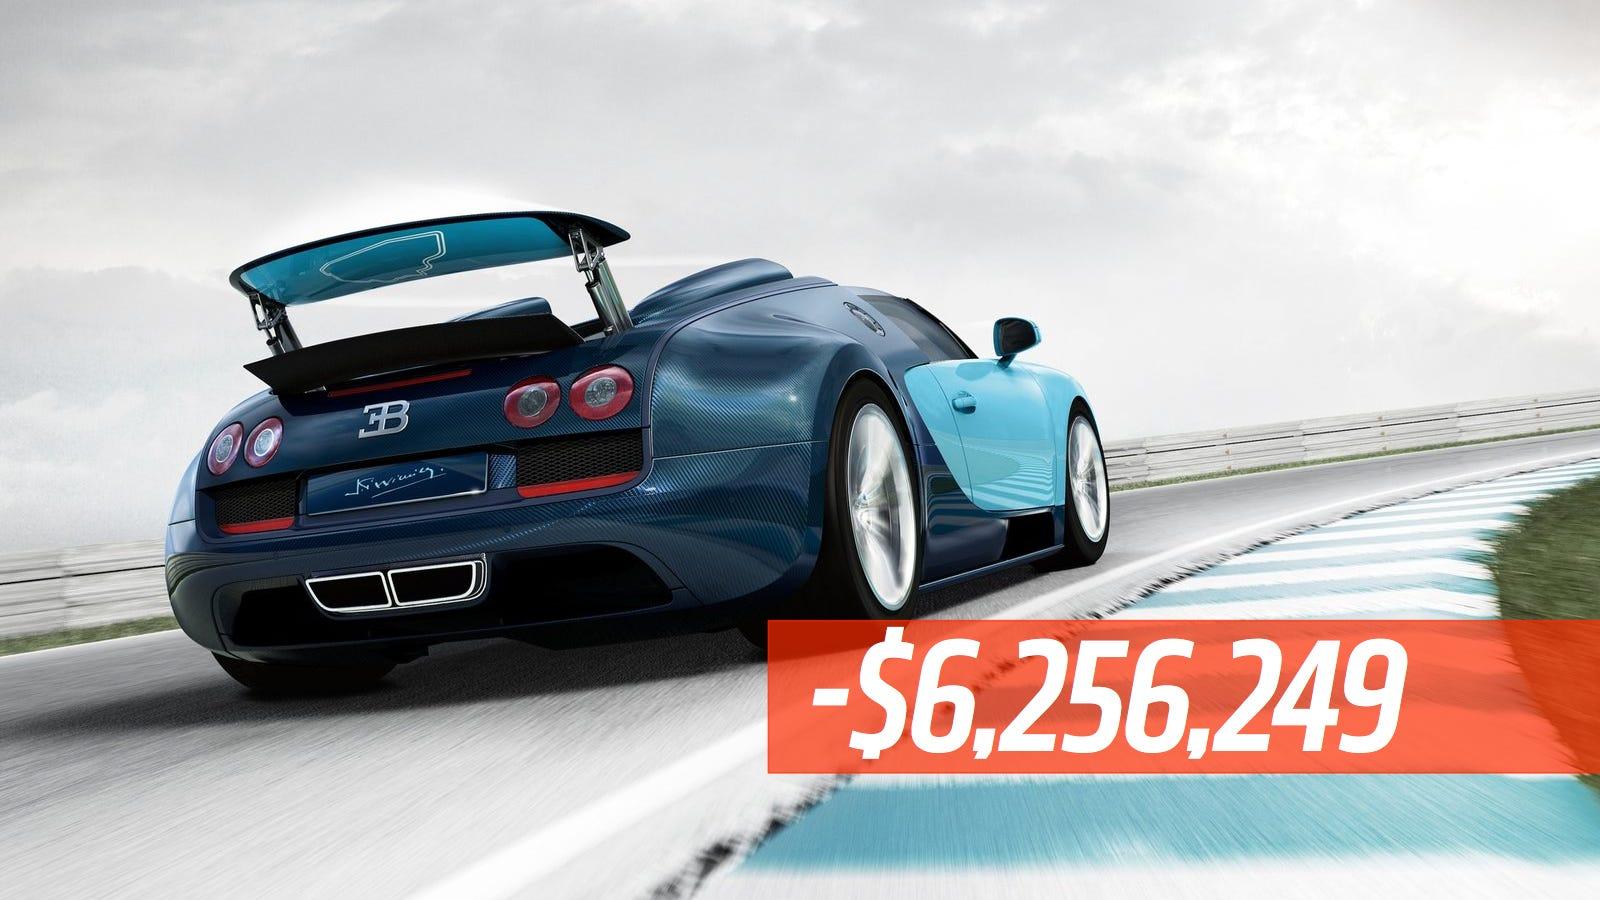 Bugatti bugatti how many made : Volkswagen Loses A Staggering $6.25 Million On Each Bugatti They Sell